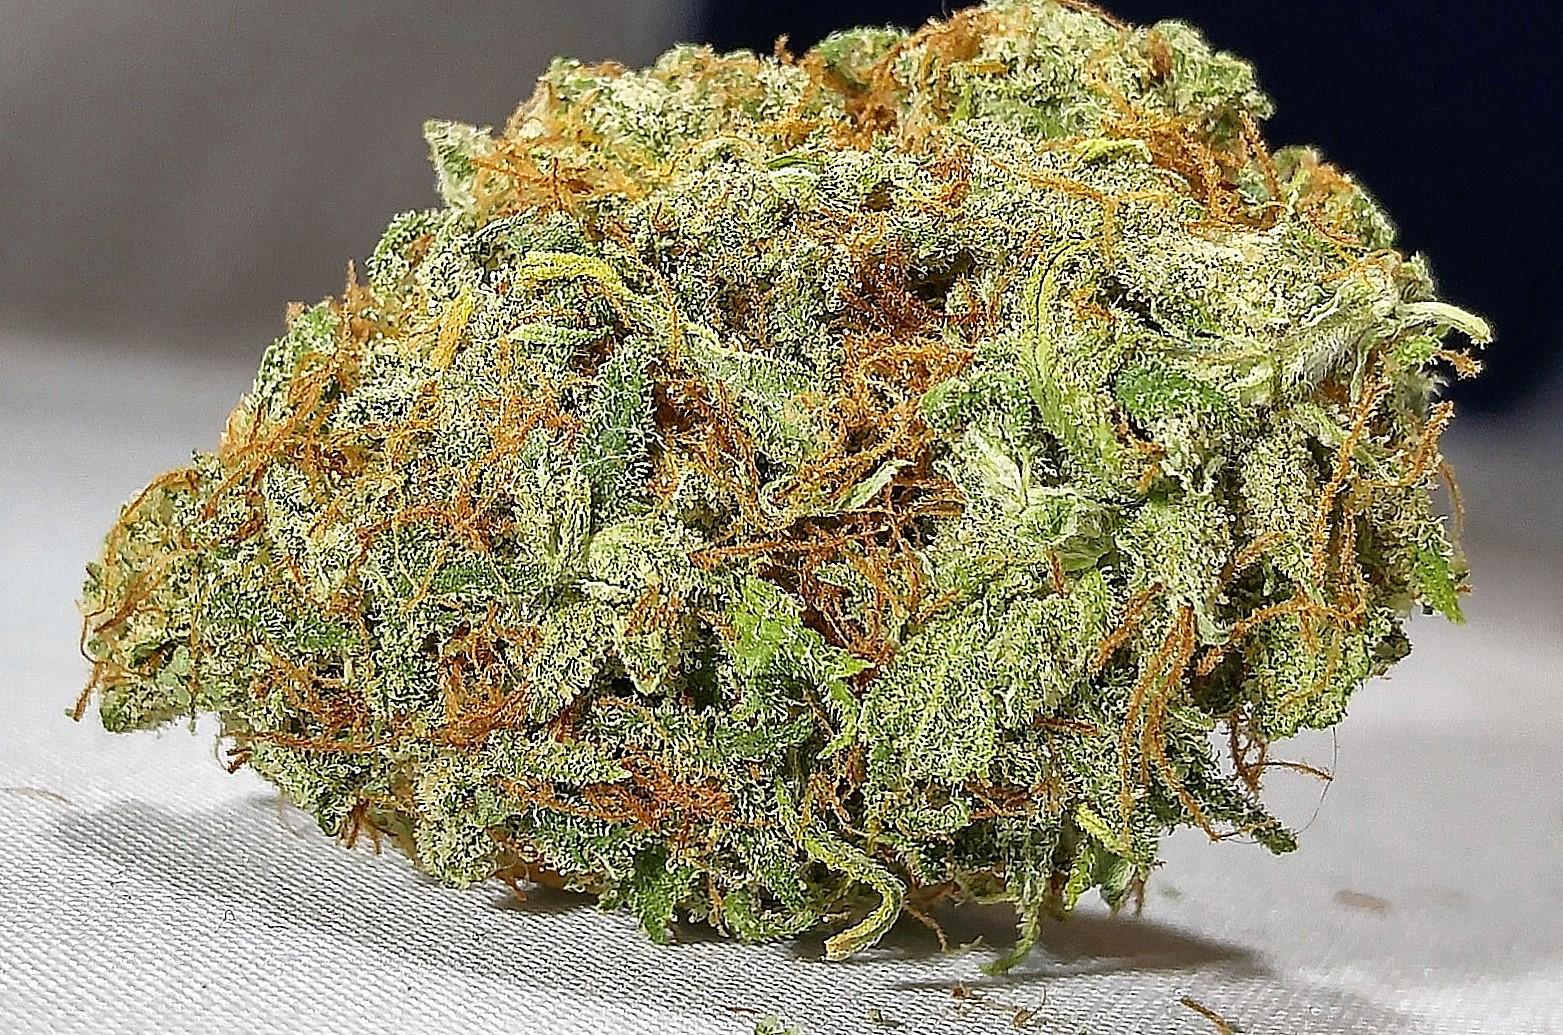 Malawi Gold Cannabis Strain Review